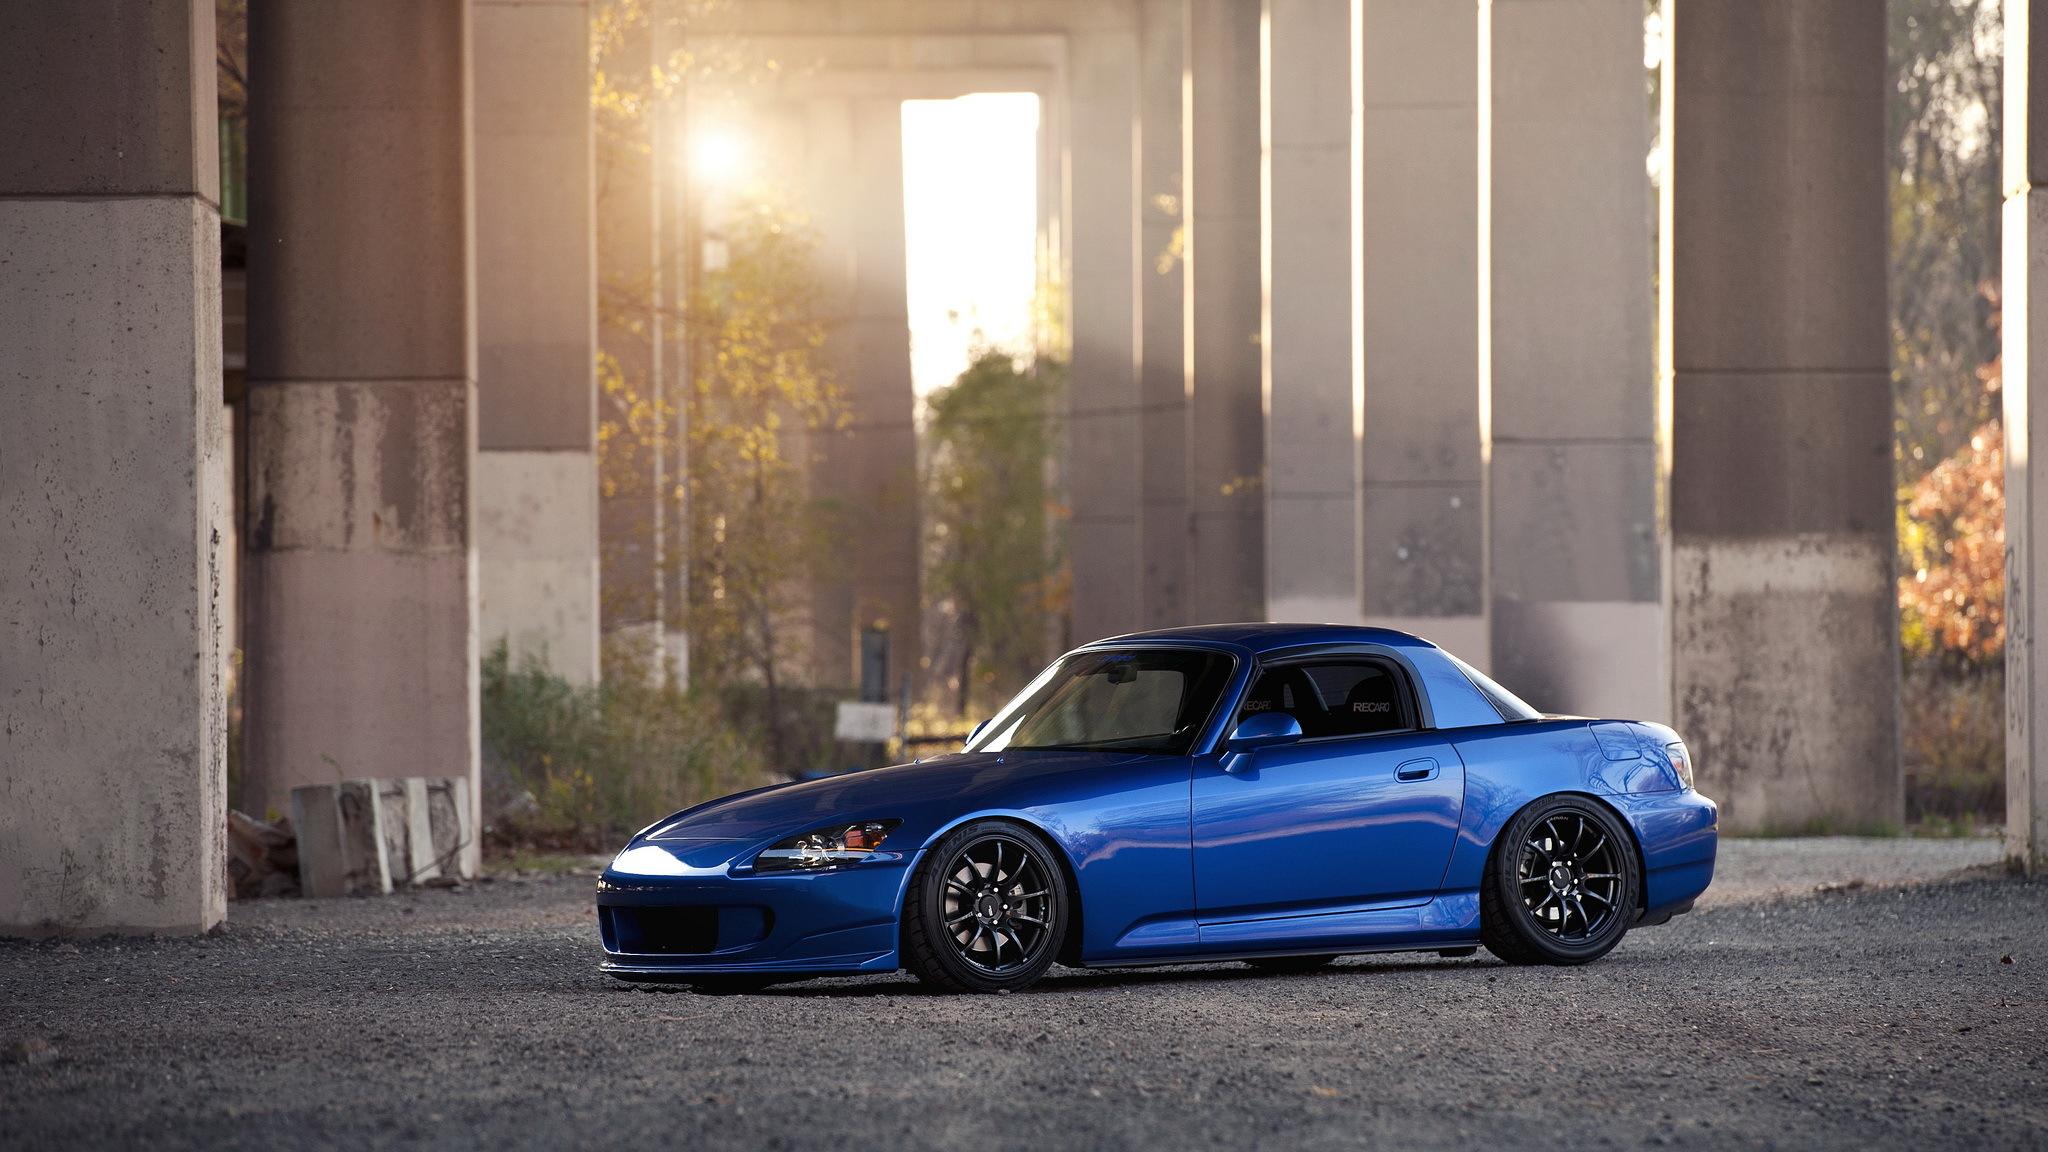 Honda S2000 Pictures